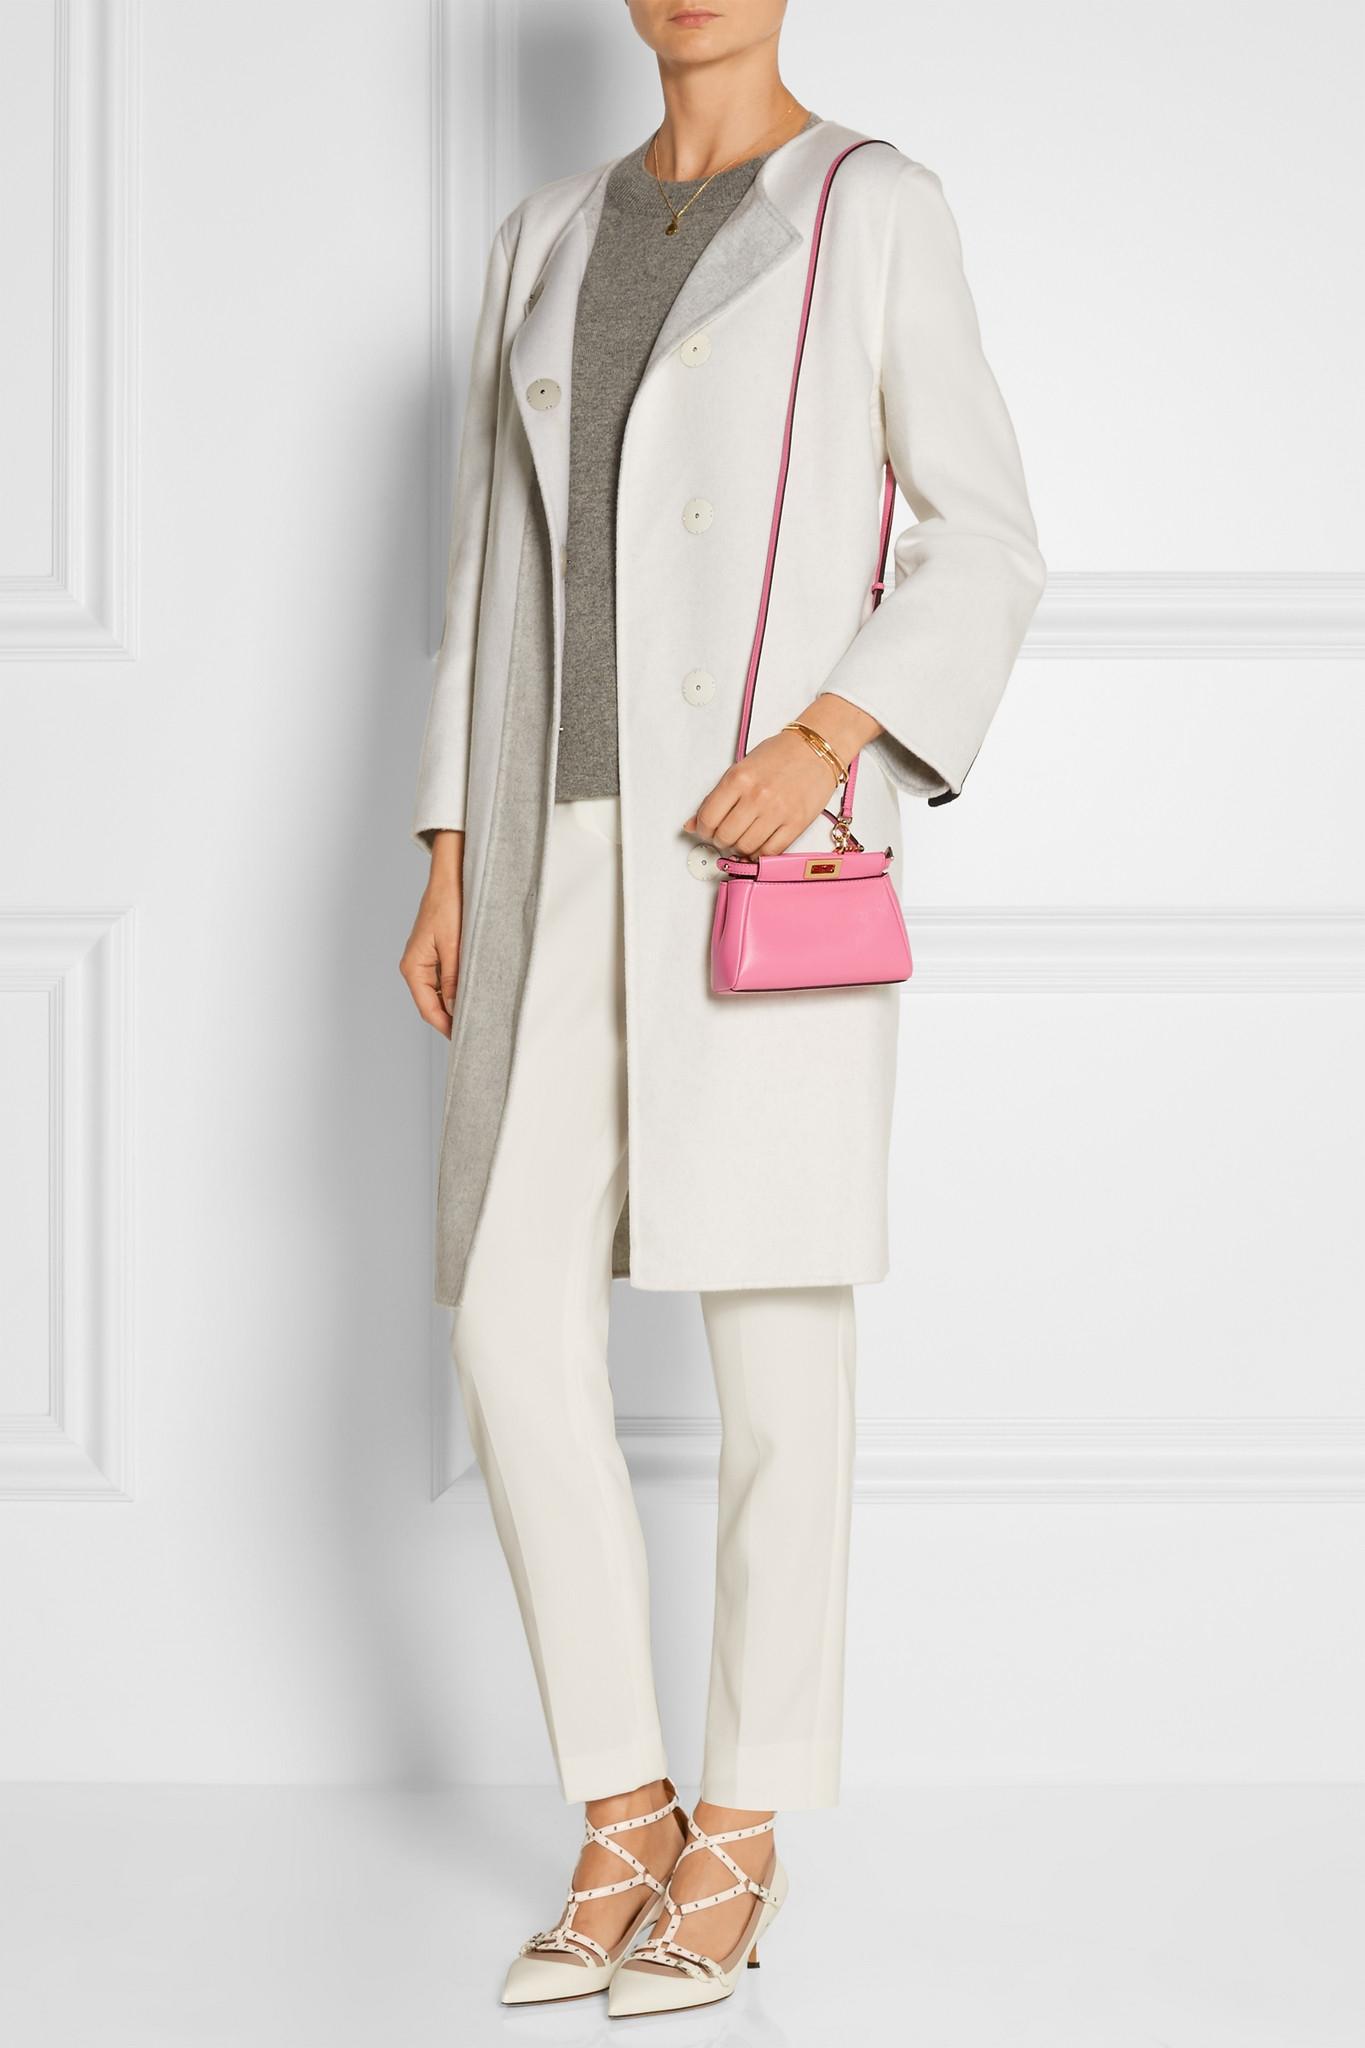 199c37cd1f17 Fendi Peekaboo Micro Leather Shoulder Bag In Pink Lyst